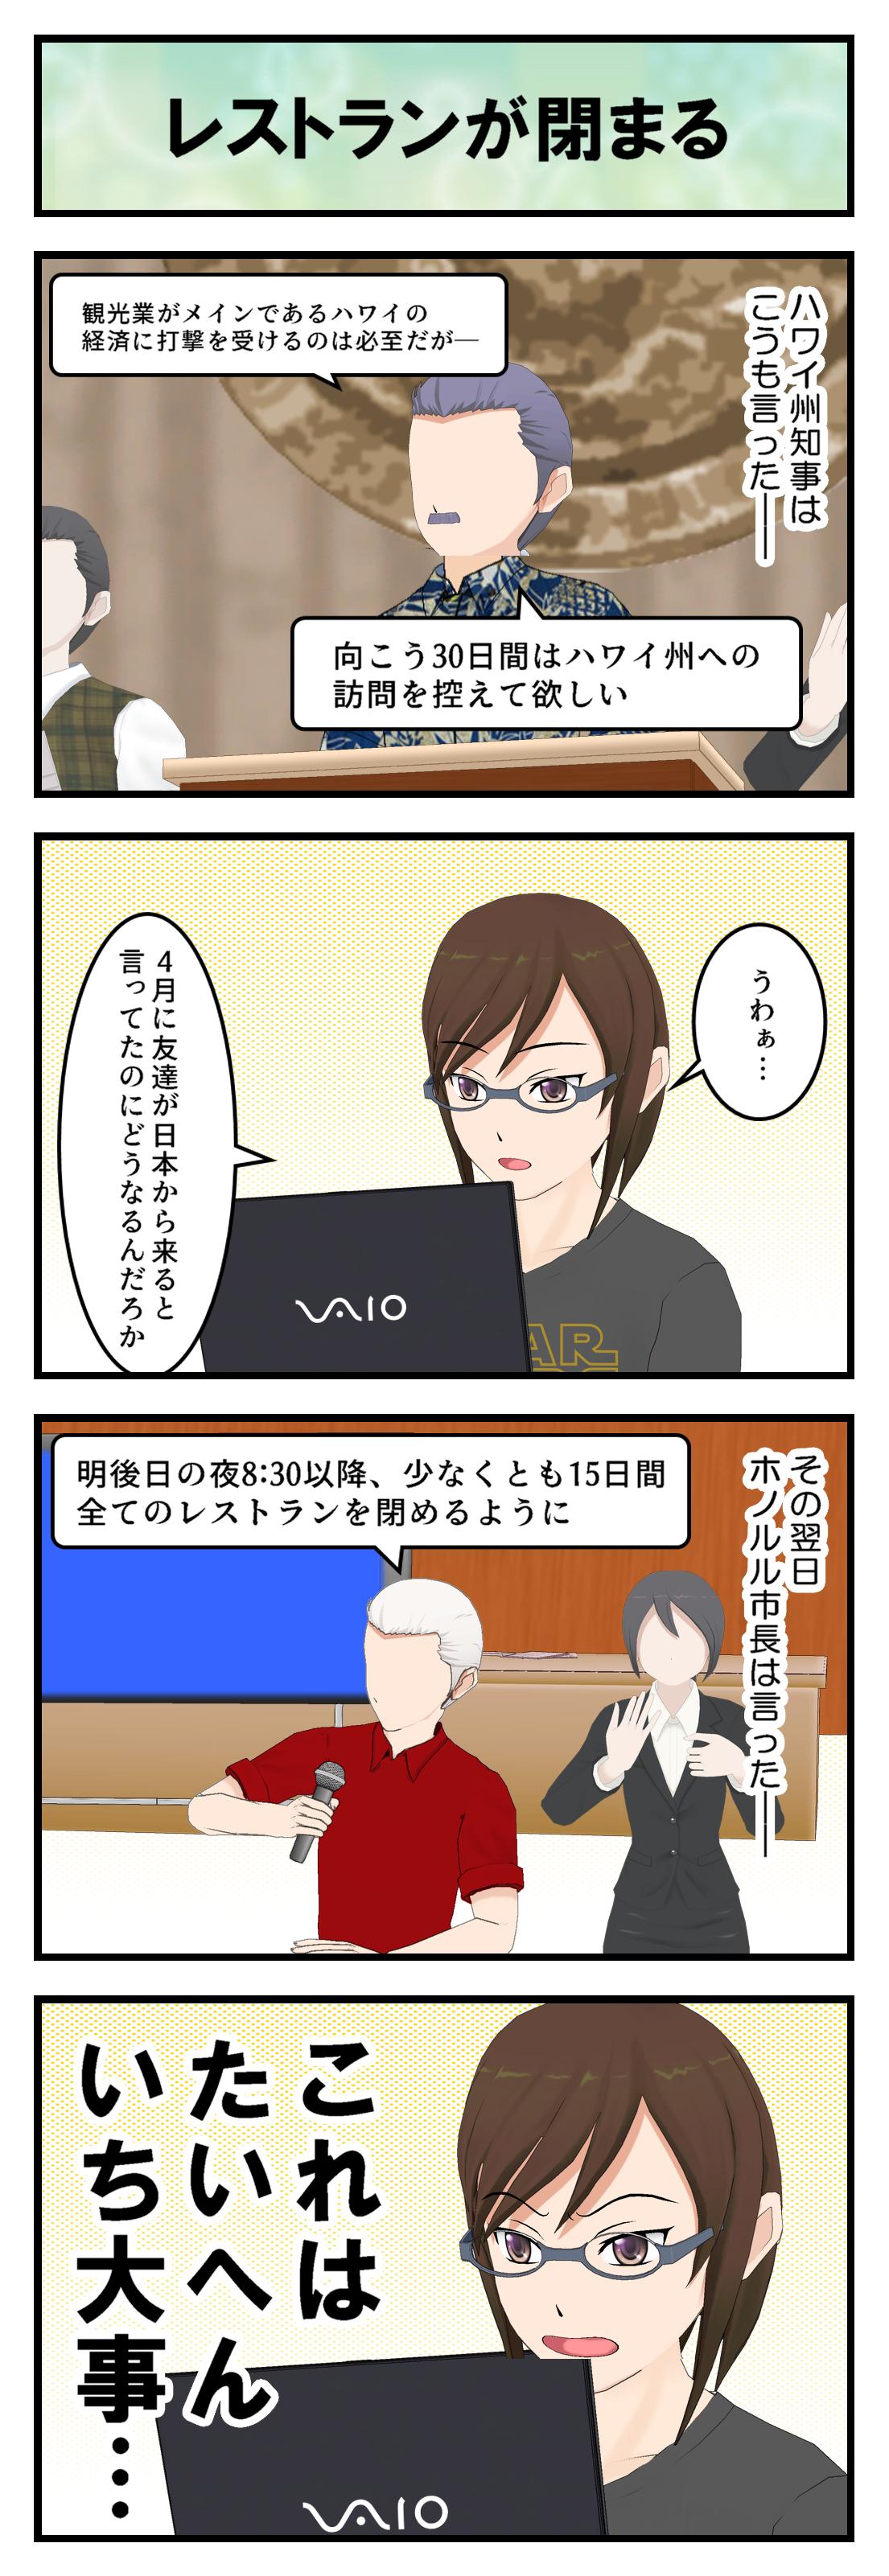 R597_市長_001